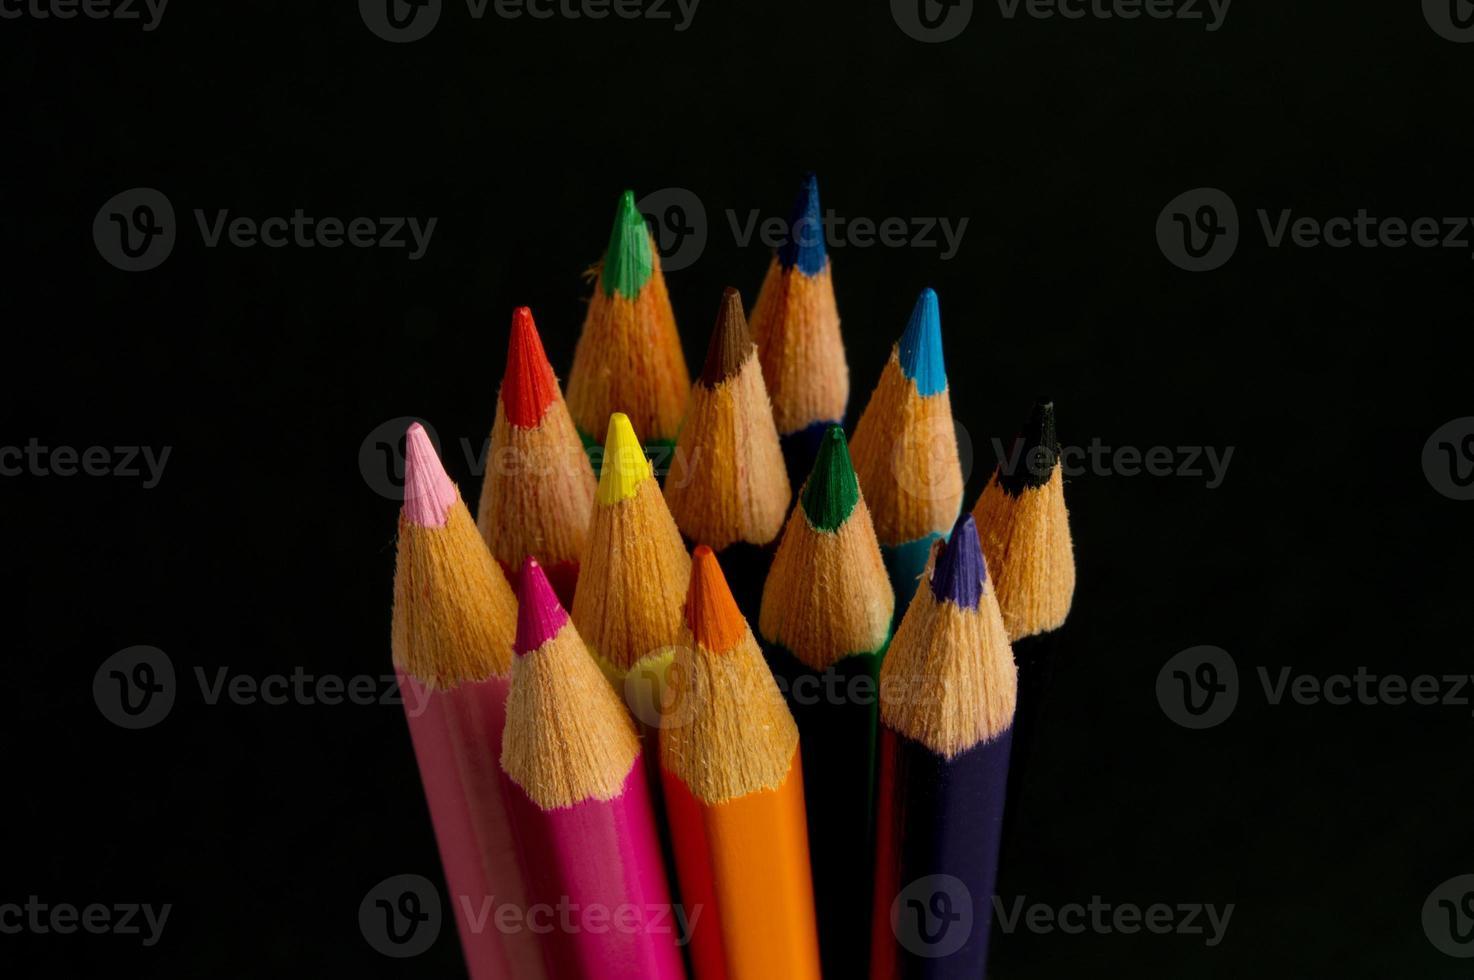 kleur potloden geïsoleerd op zwart foto